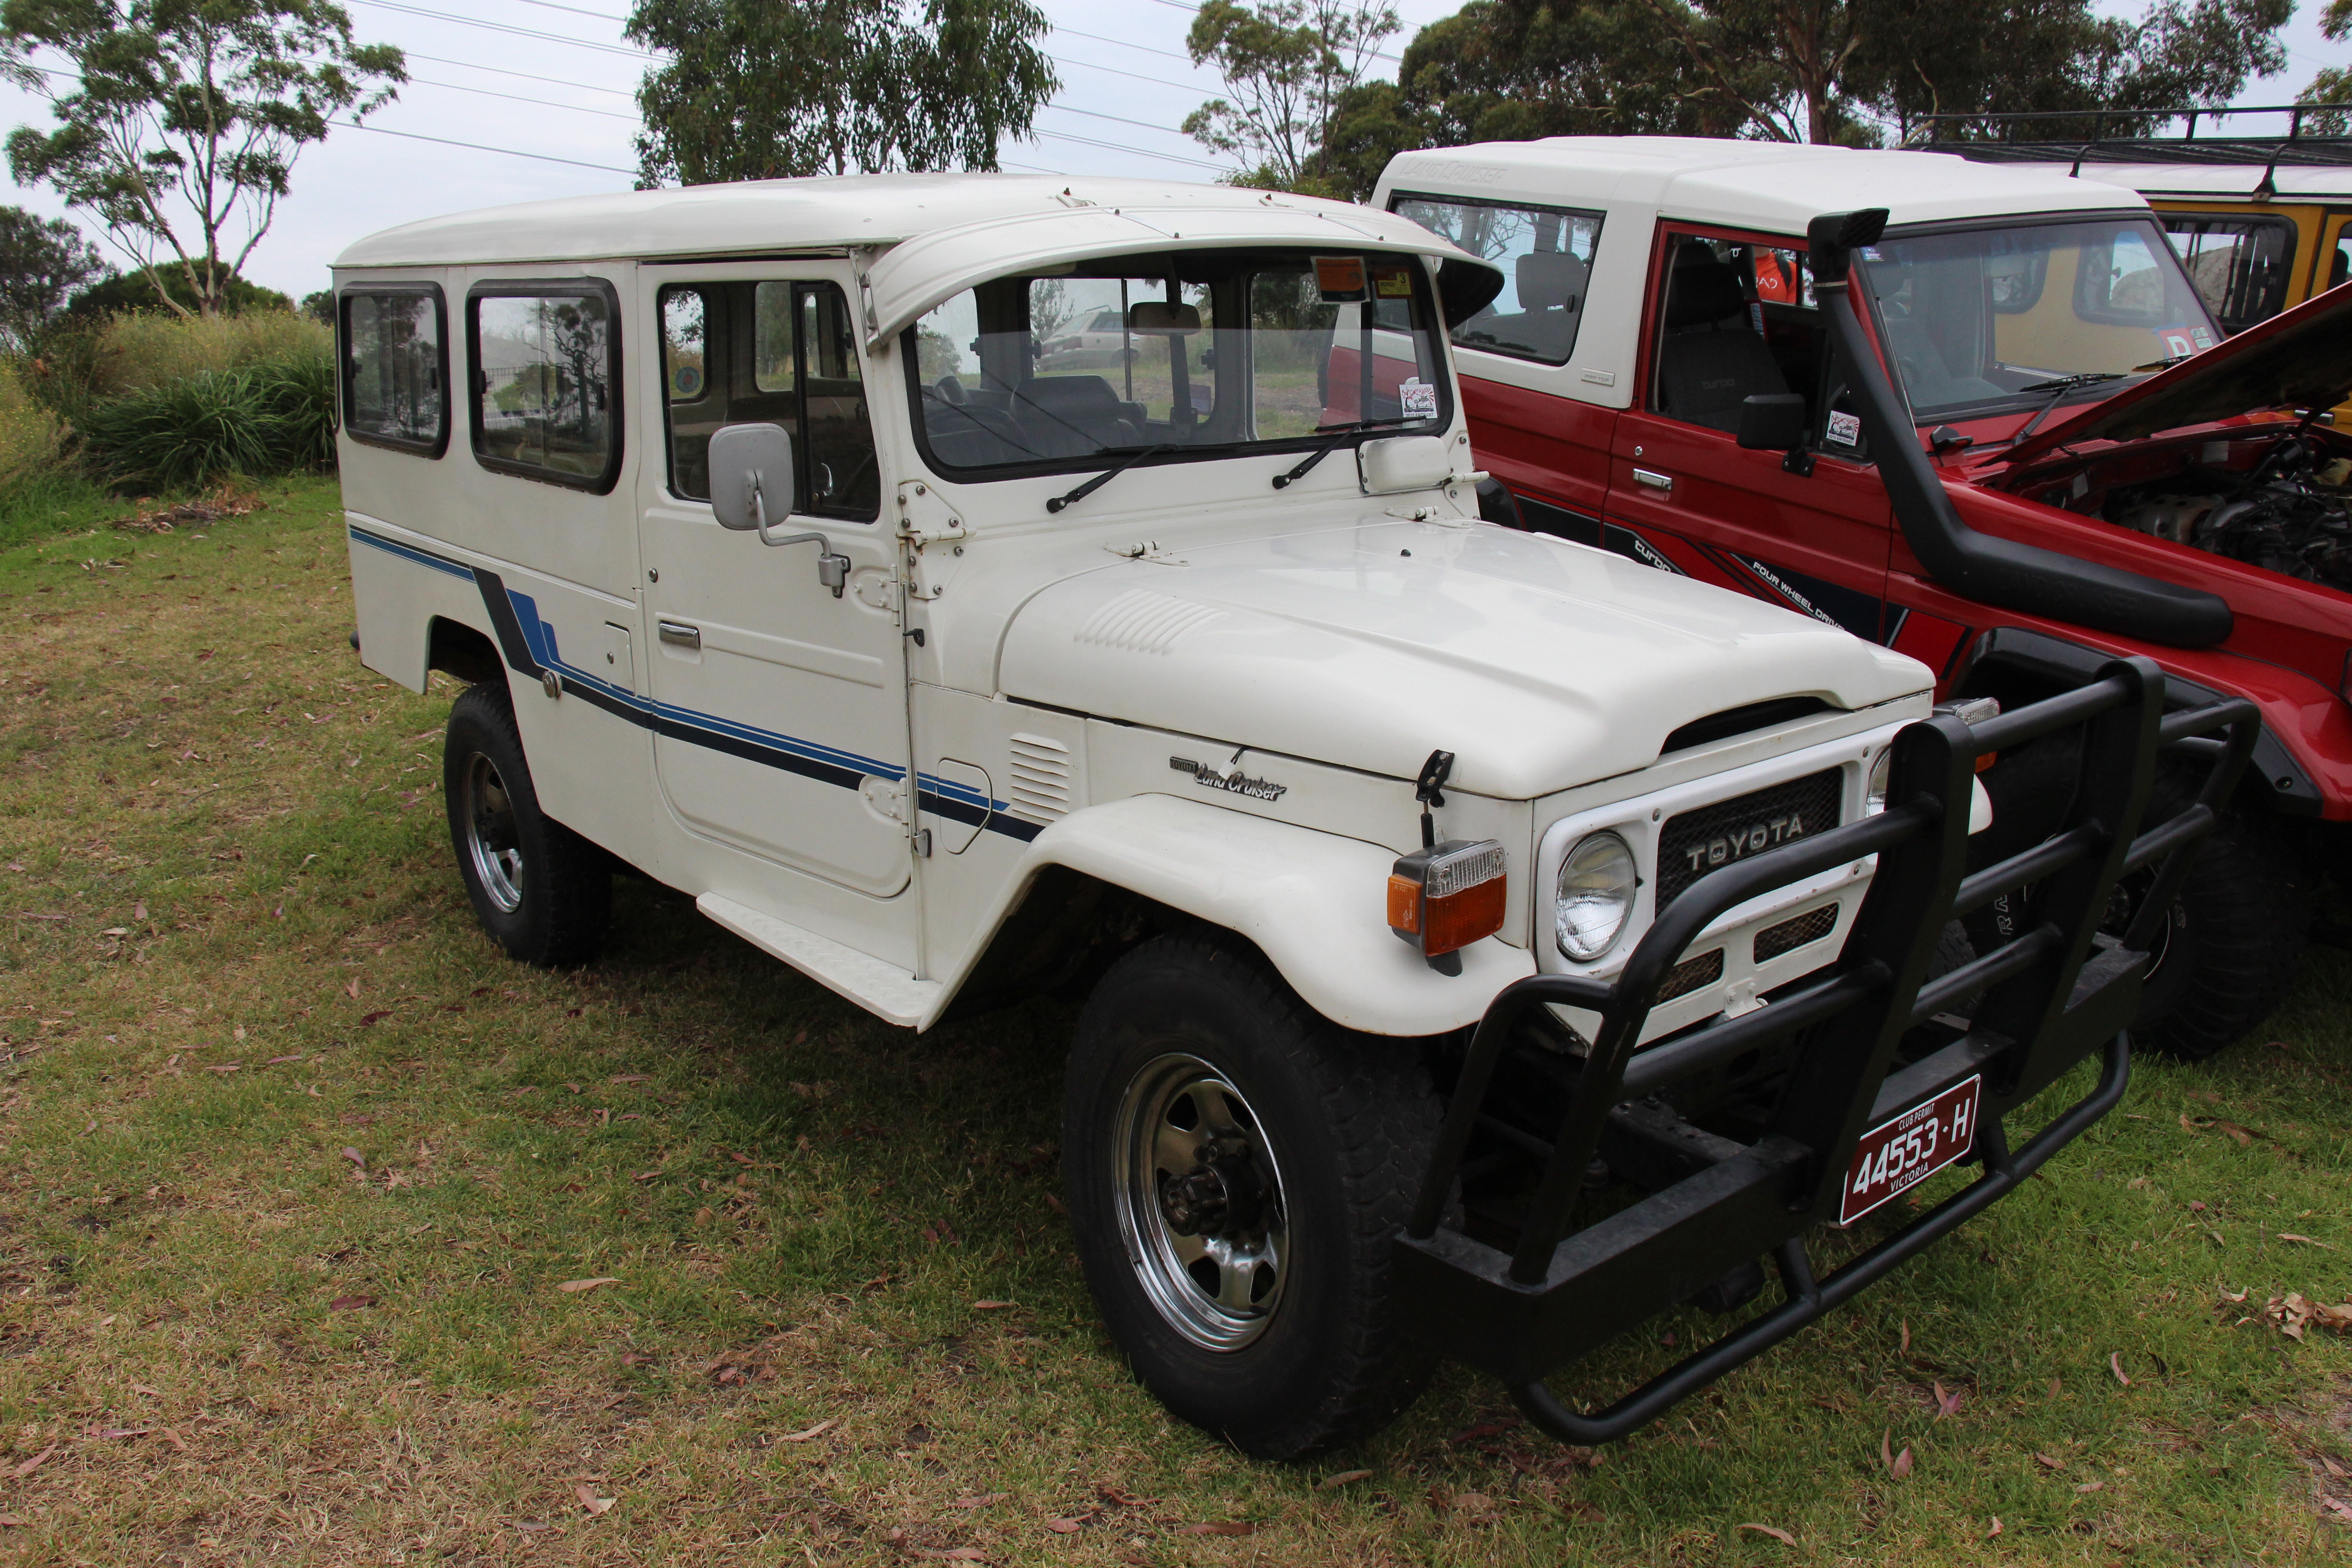 File:1977 Toyota Landcruiser FJ45 Wagon (23155194243) jpg